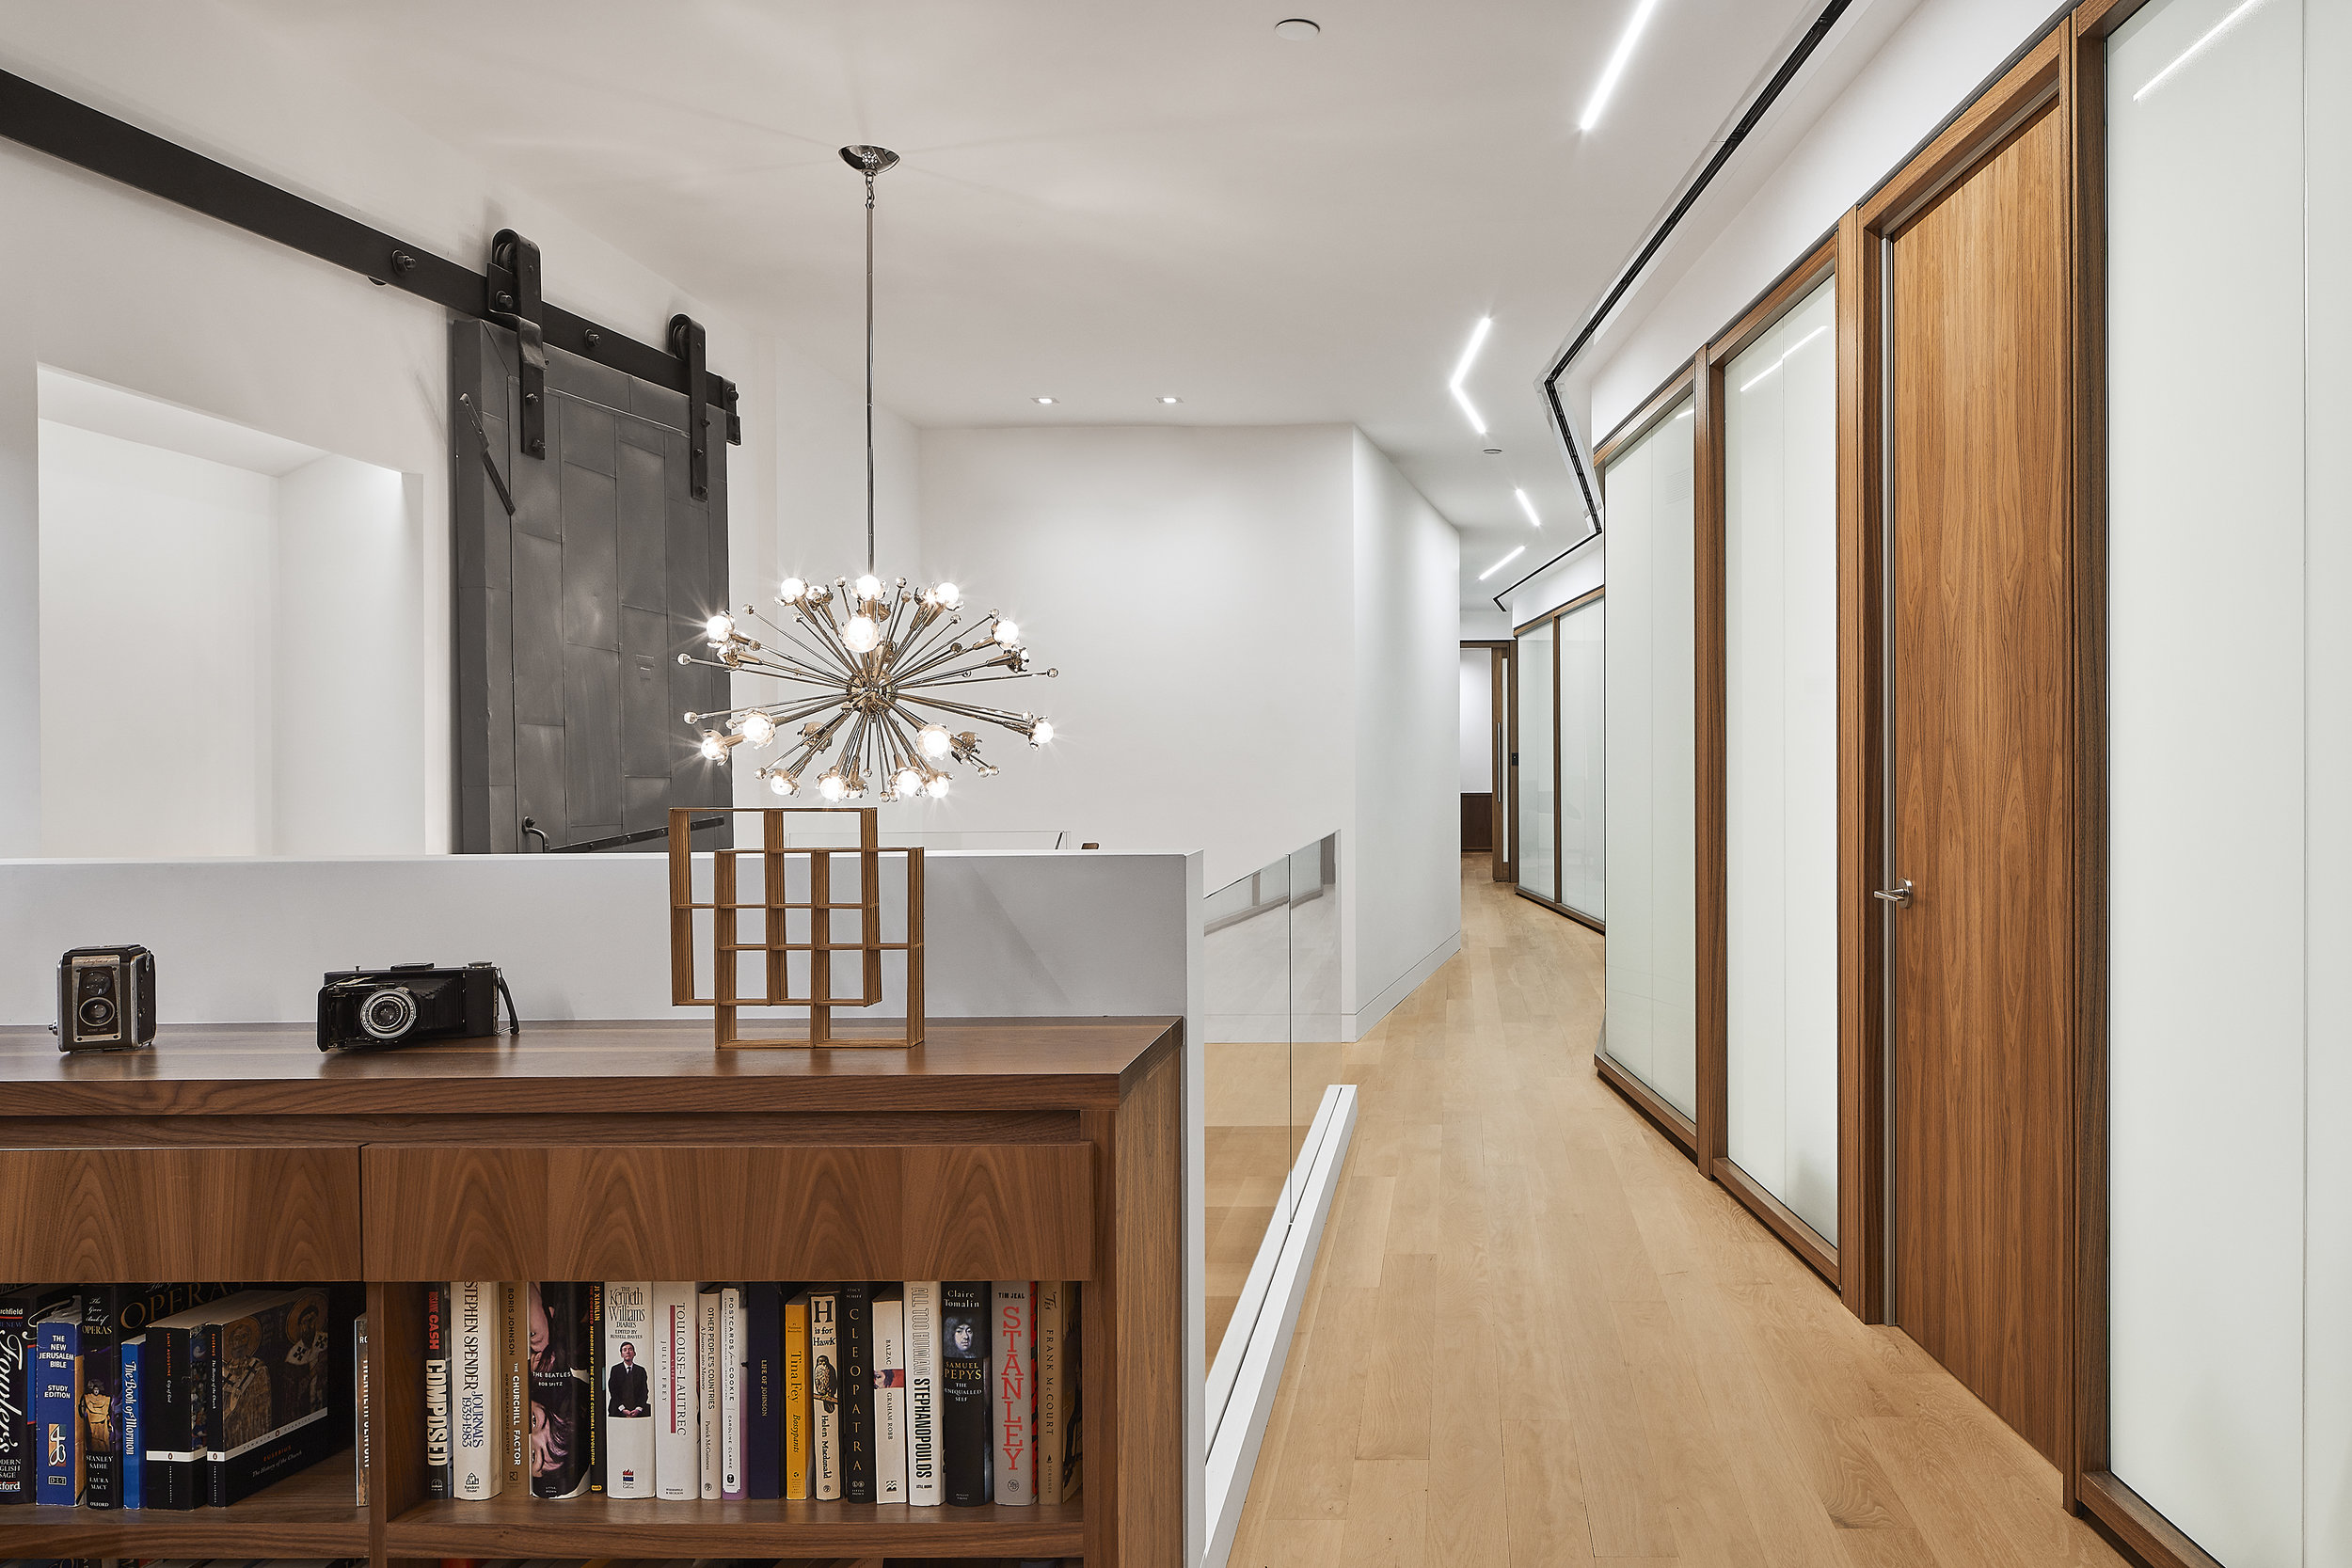 turkel_design_modern_prefab_home_soho_loft_entryway_living.jpg